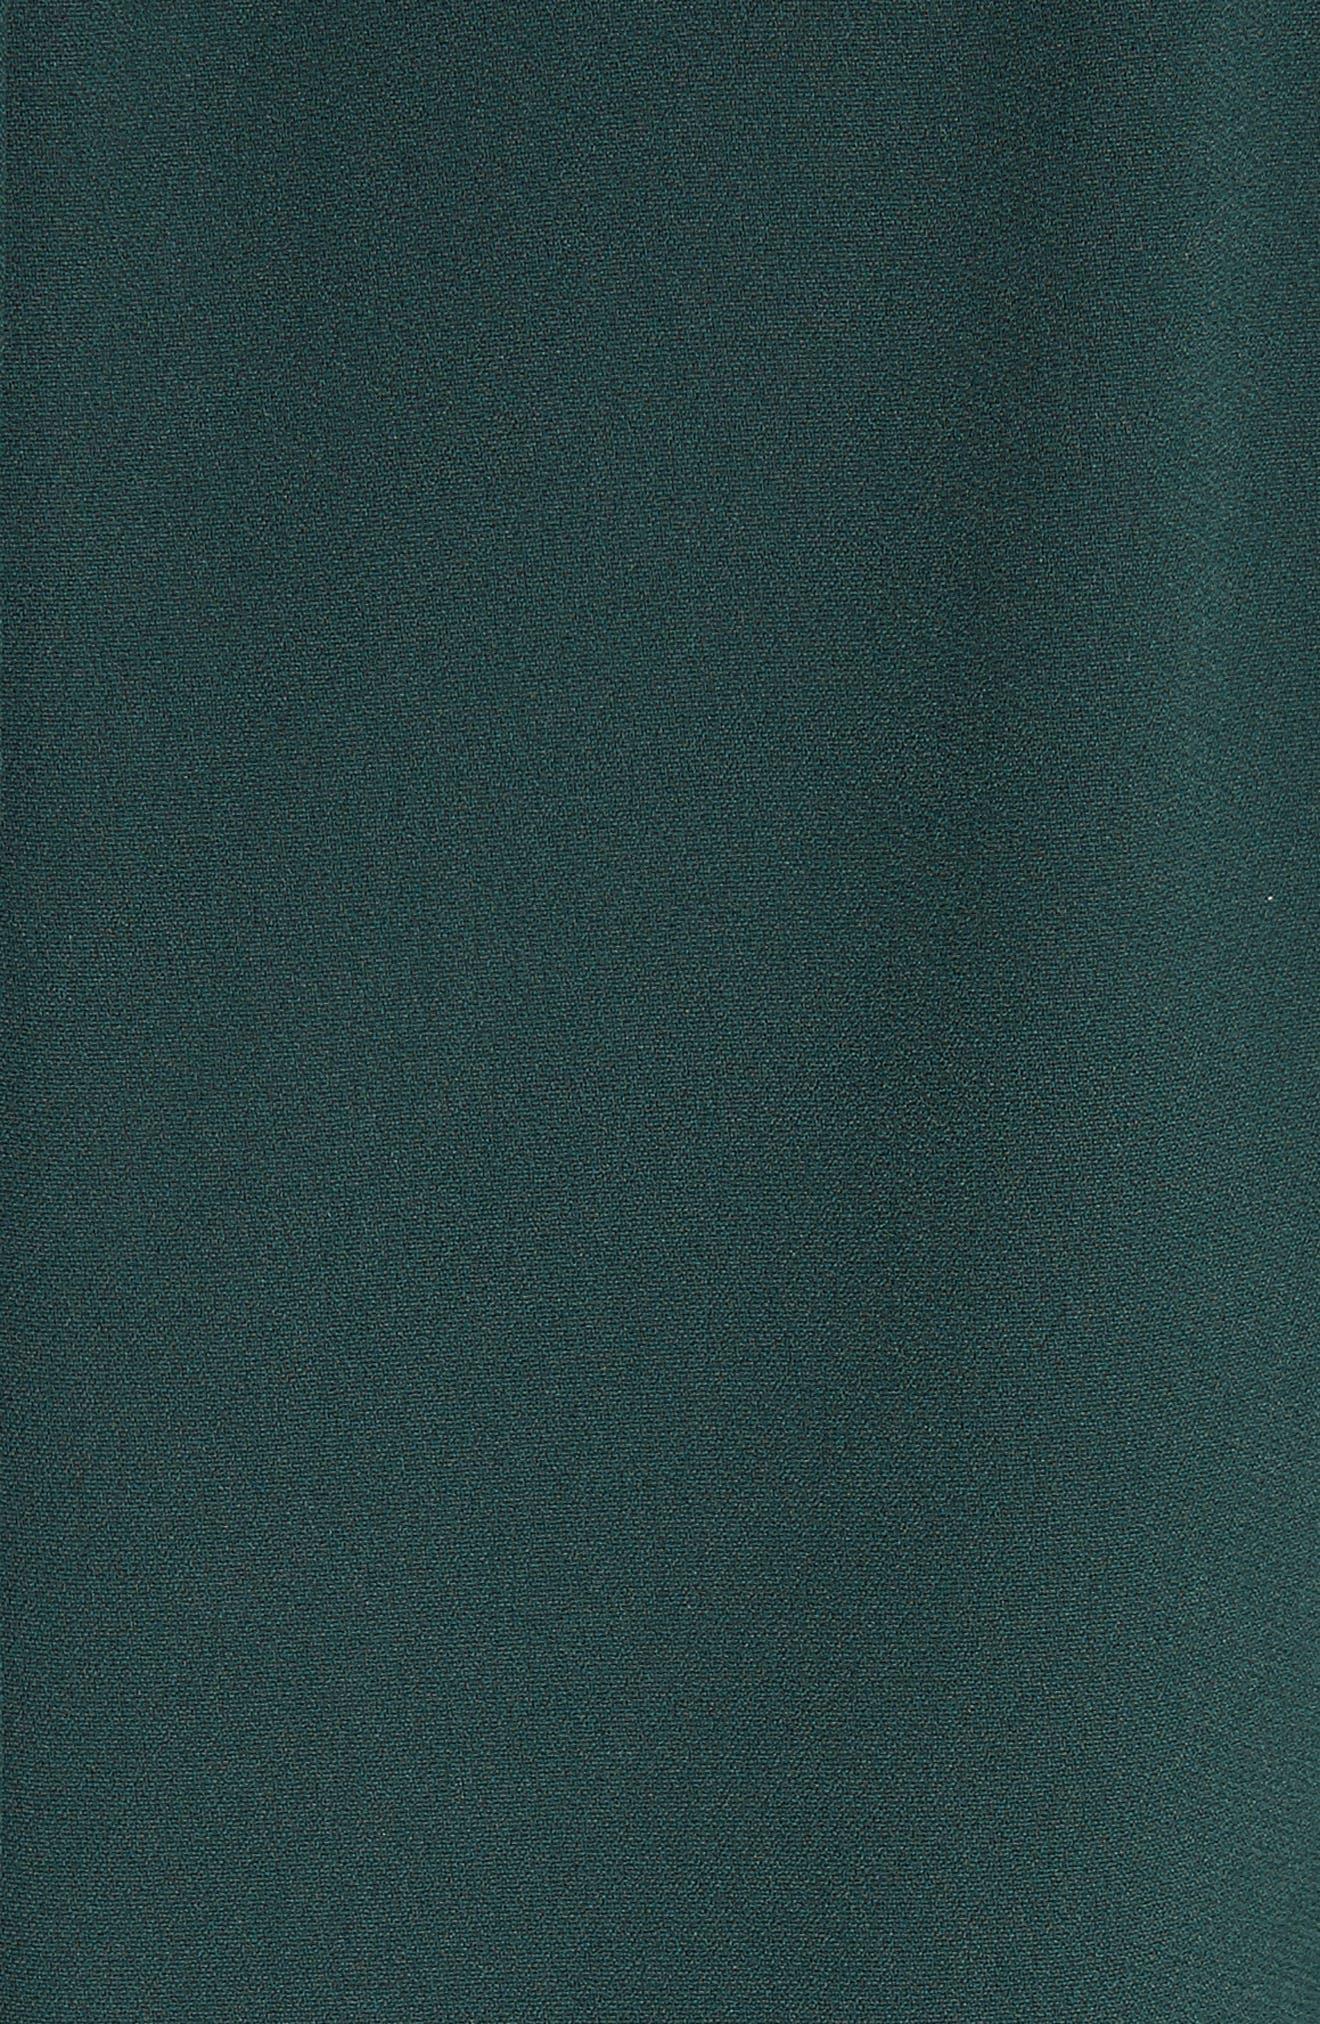 Button Trim Ruffle Hem Dress,                             Alternate thumbnail 5, color,                             301